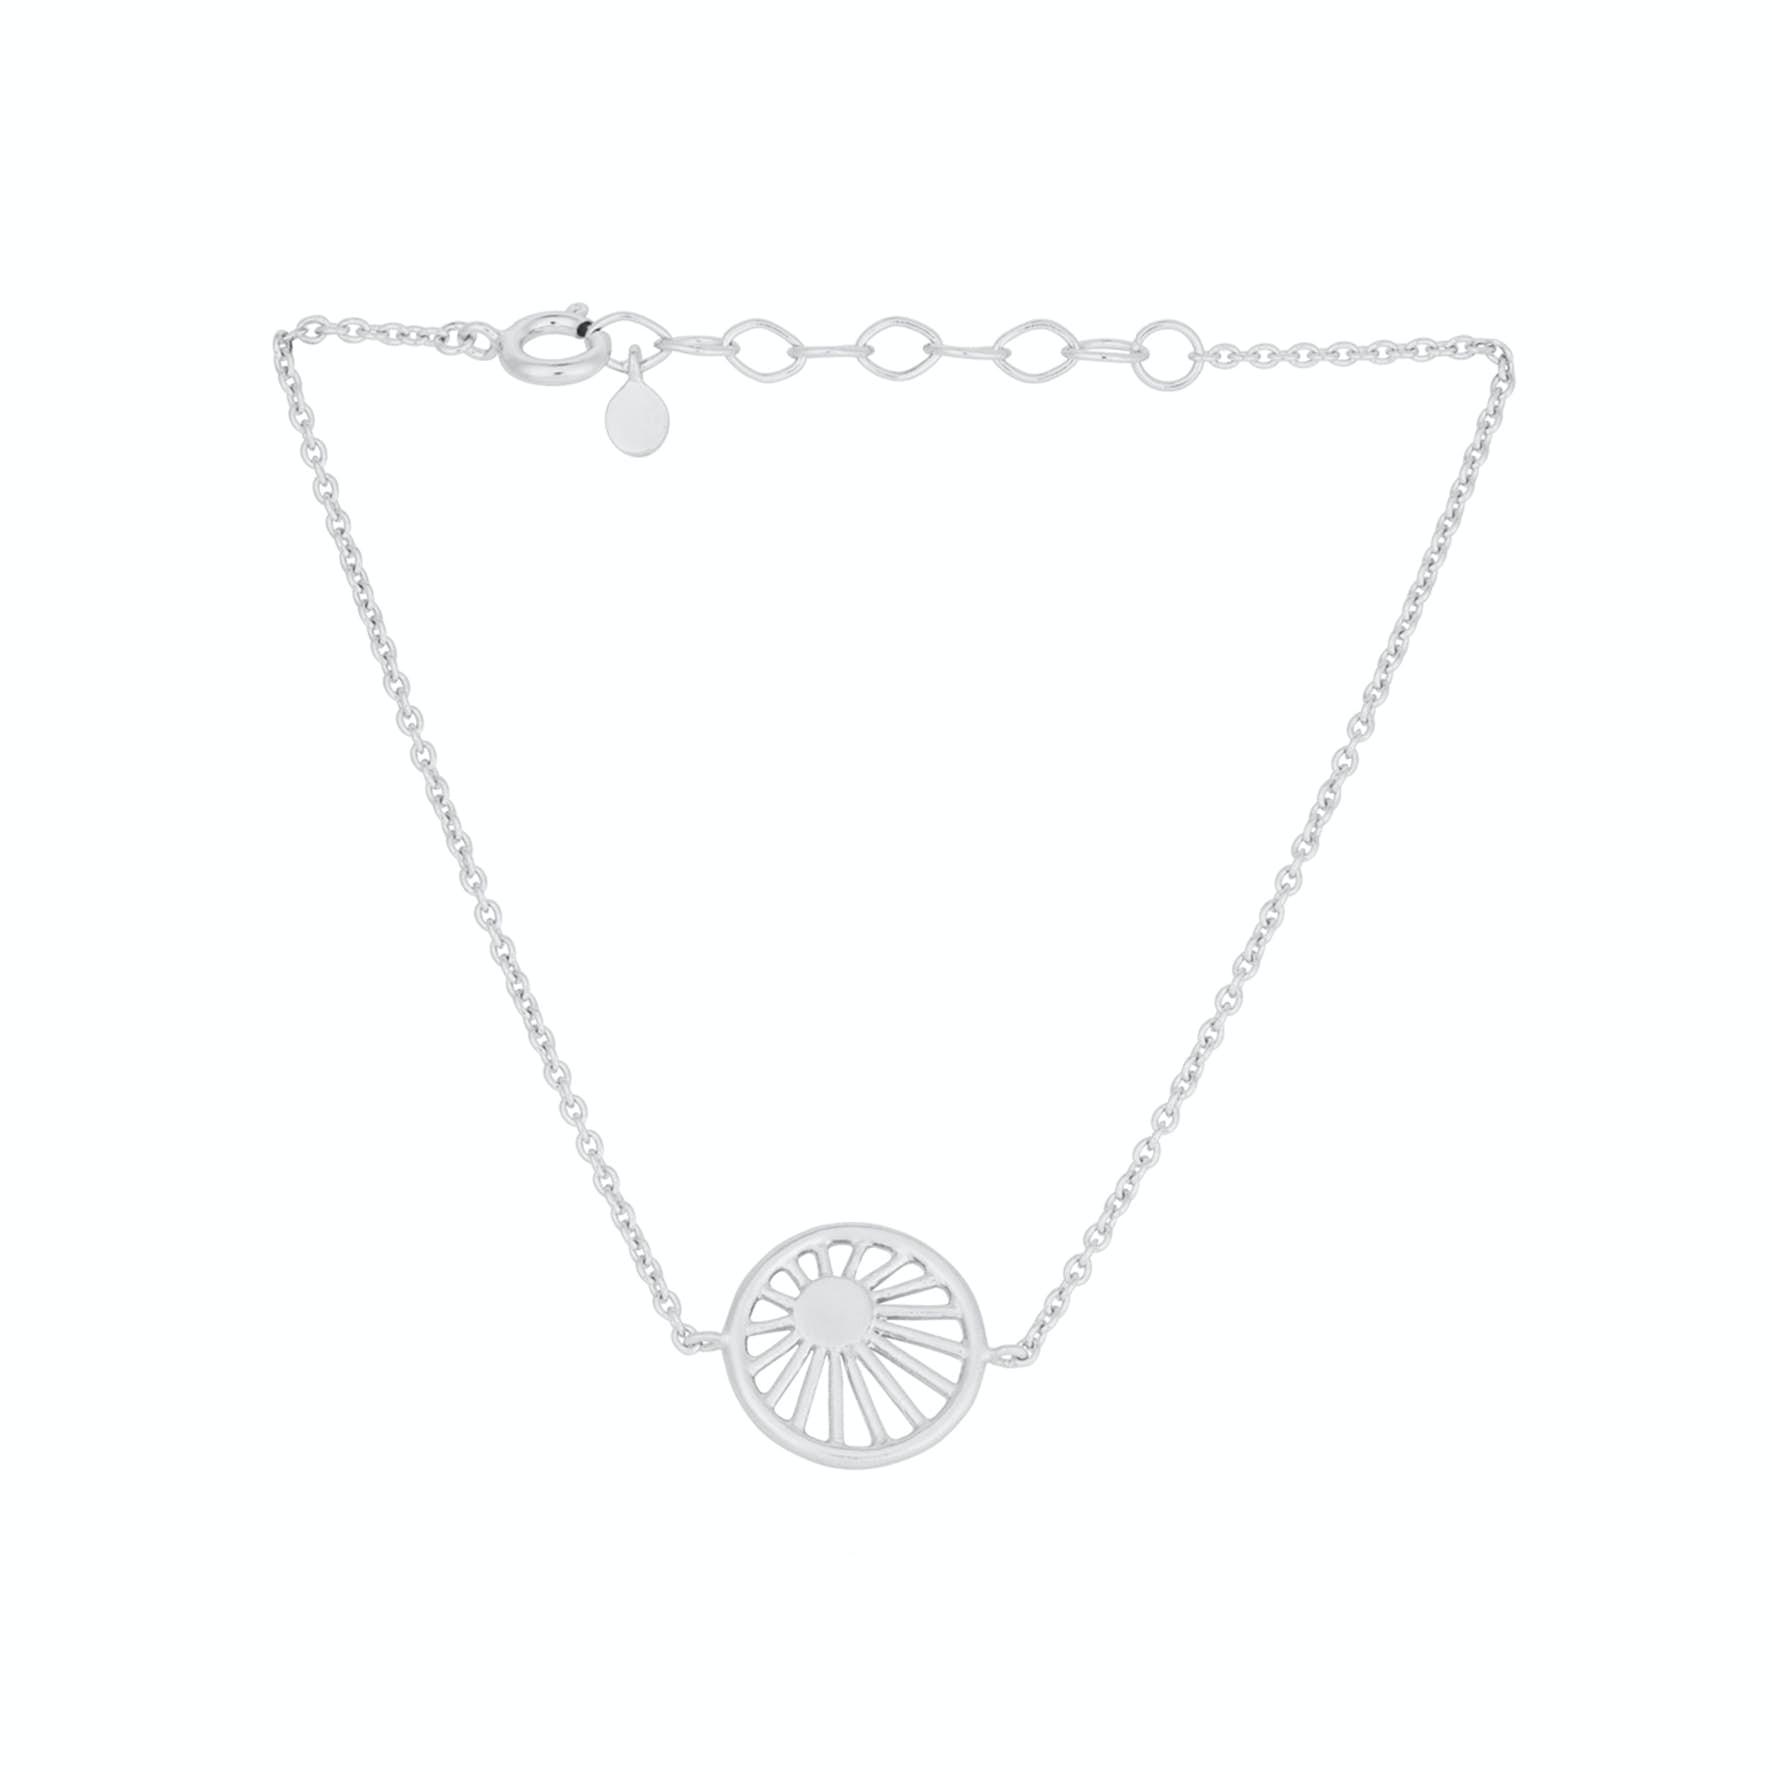 Daydream Bracelet från Pernille Corydon i Silver Sterling 925